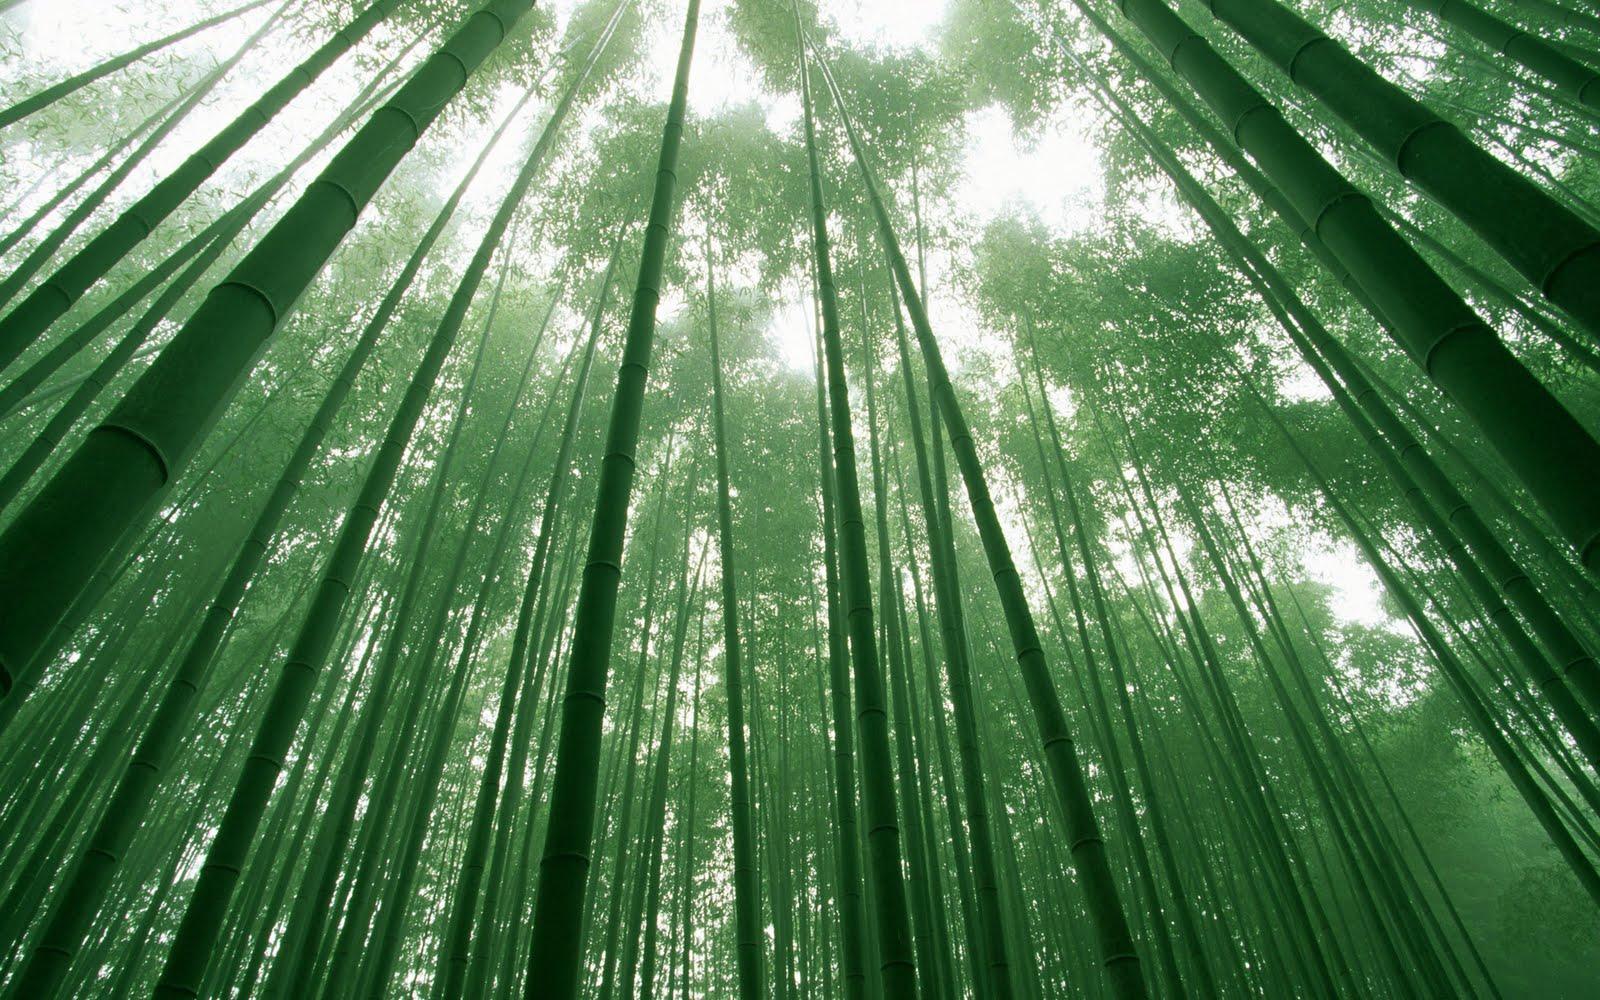 http://2.bp.blogspot.com/-Skh9nmsA5d4/Tp2Cj-FTqHI/AAAAAAAABHU/Ty0PW_Vygpo/s1600/Bamboo%2BForest%2BWallpaper.jpg